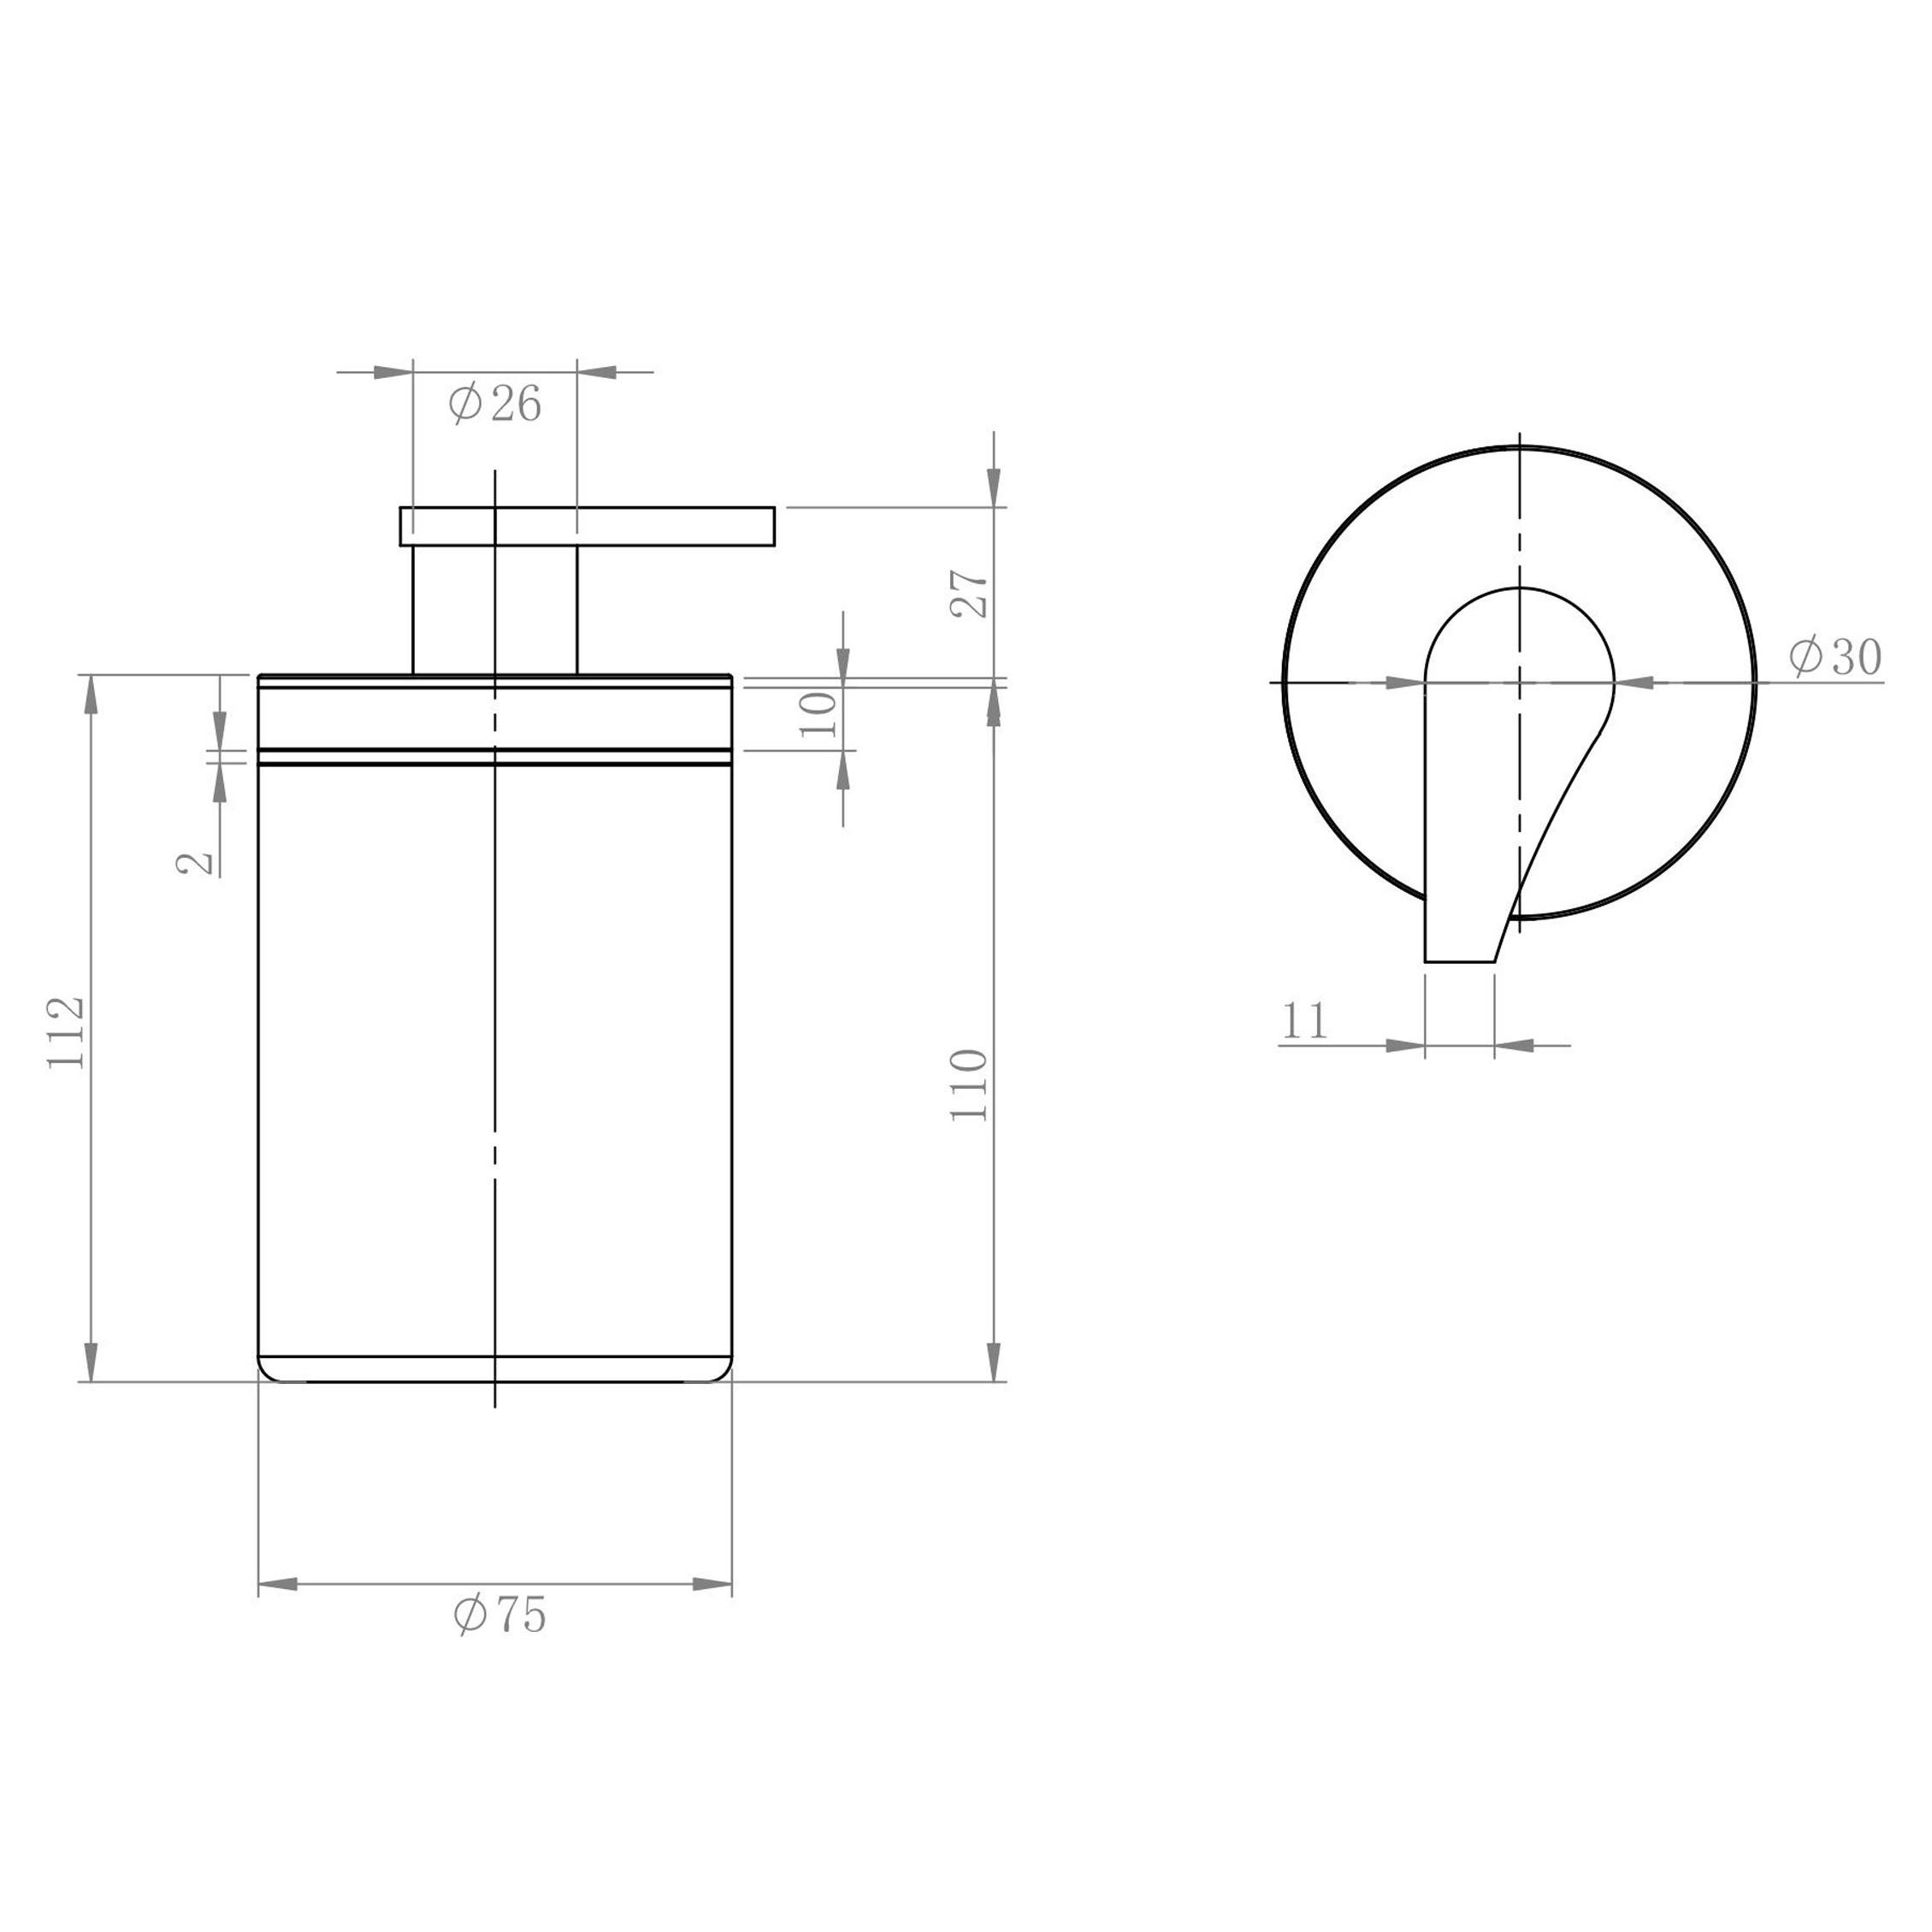 Edler Seifenspender SDVSS aus hochwertigem Edelstahl Design rund - Serie VERSA - chrom